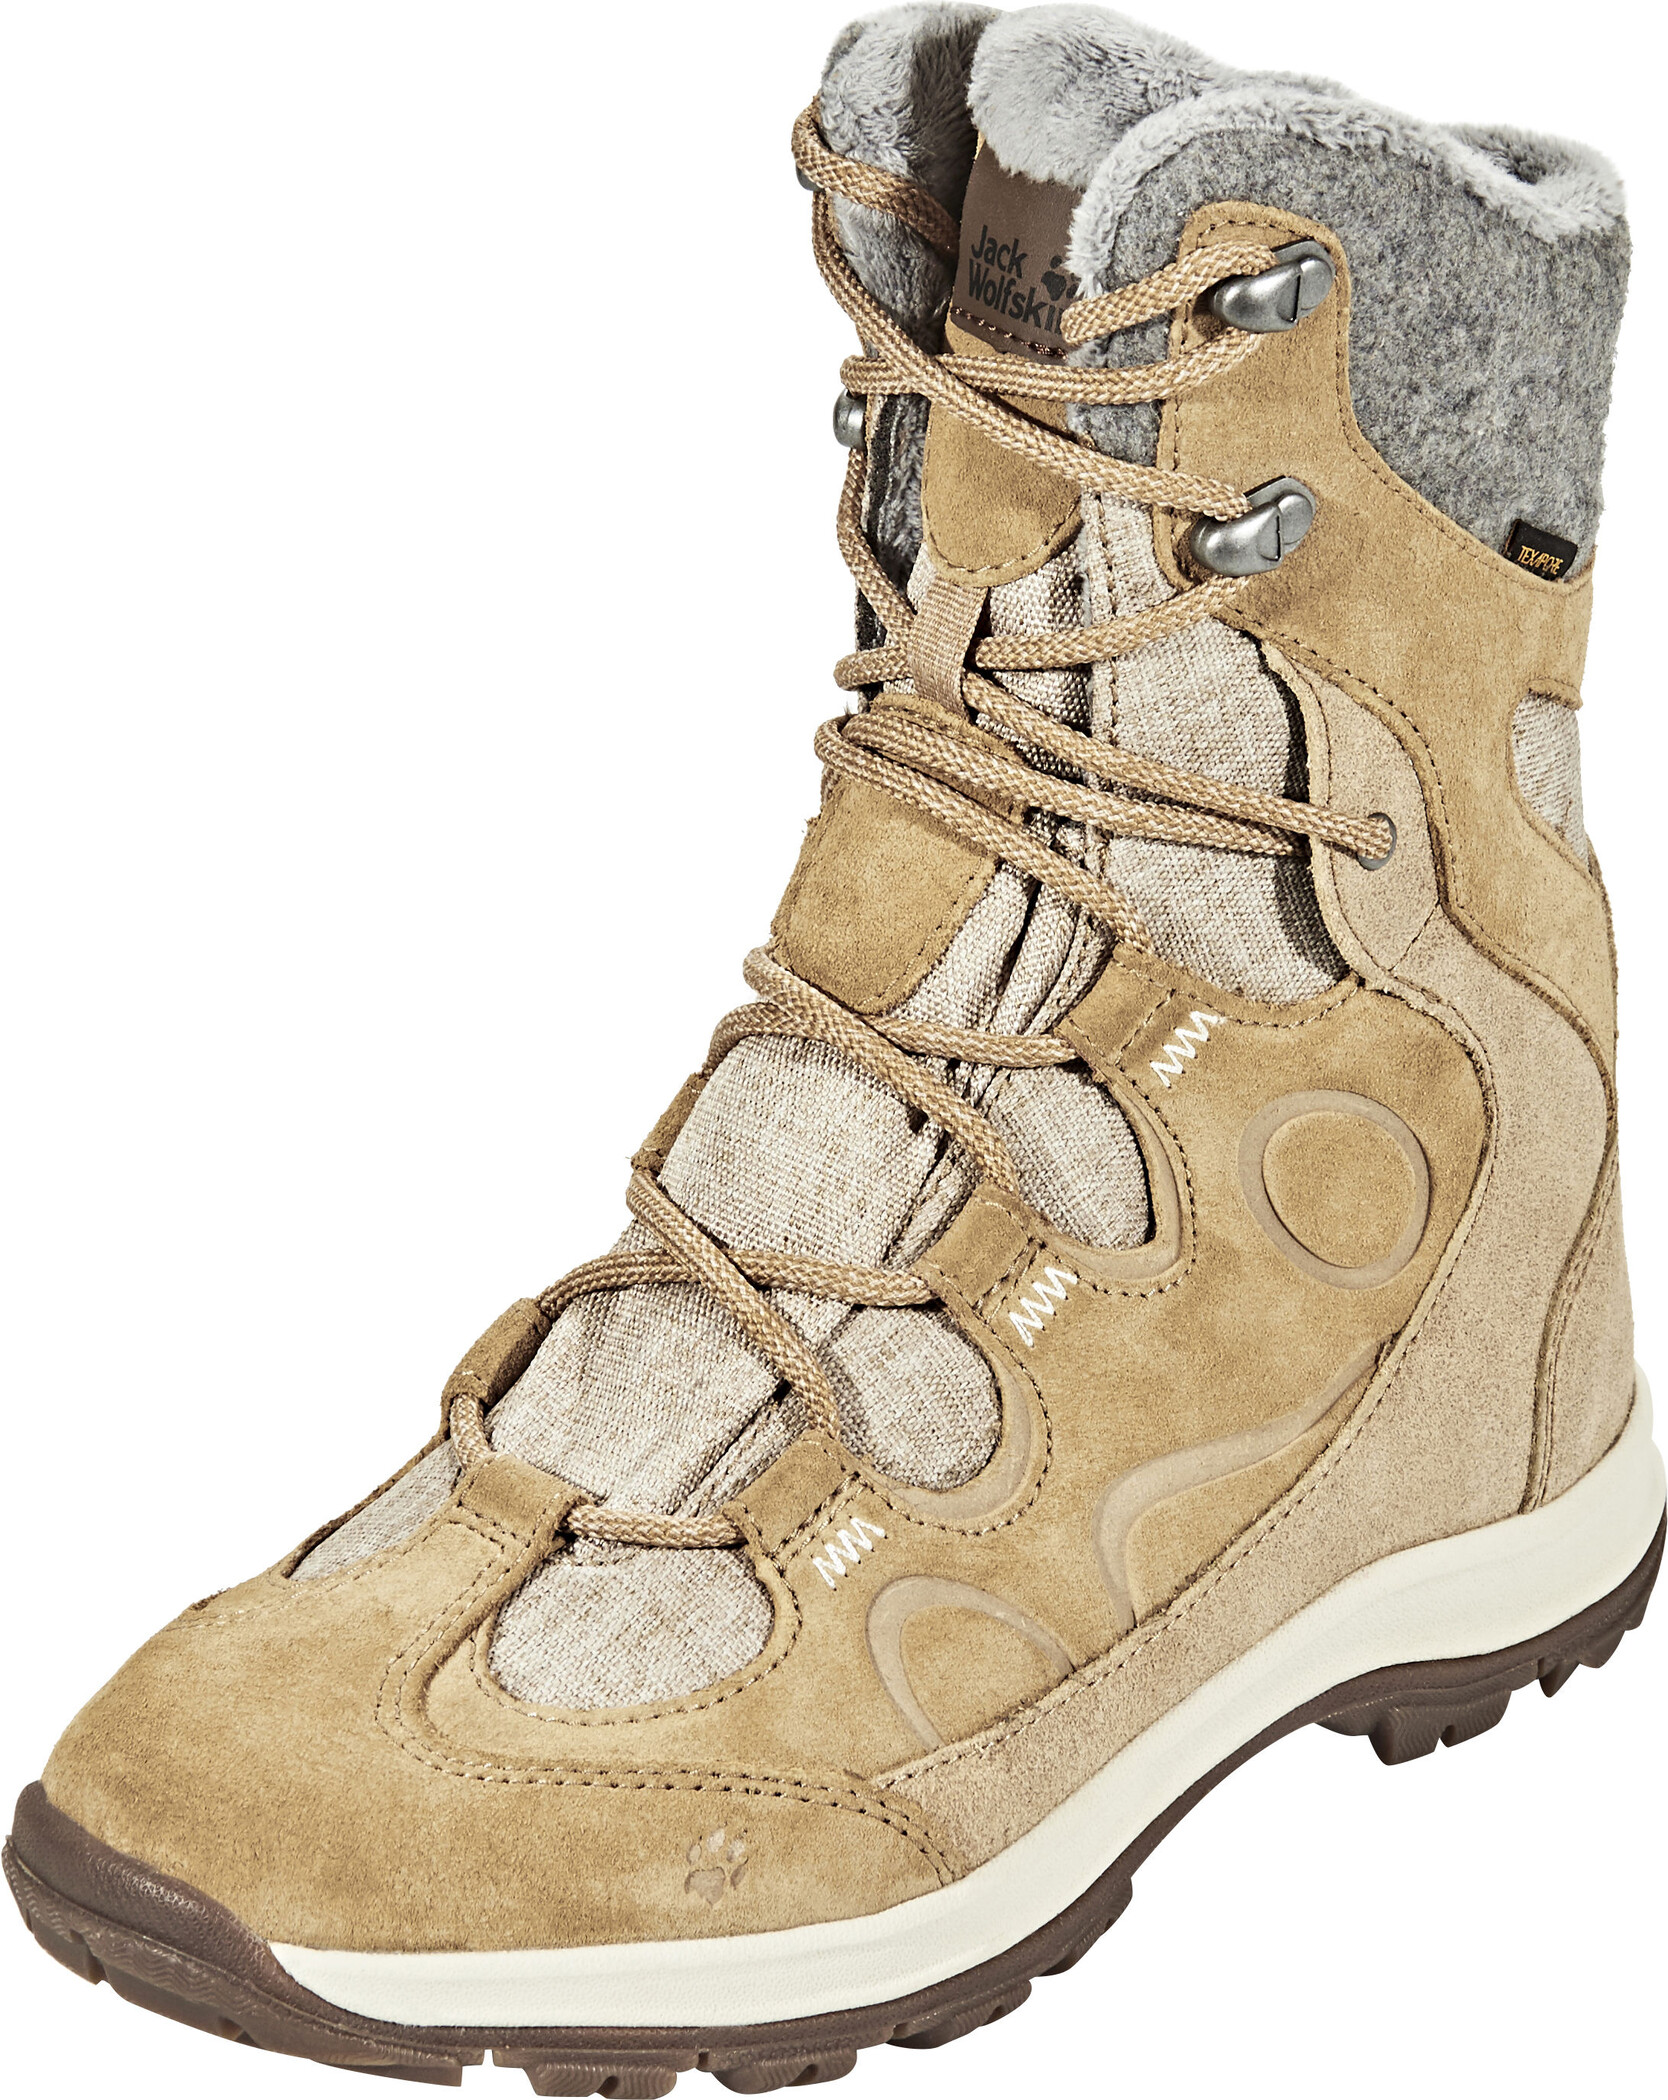 pretty nice d61c1 554e9 Jack Wolfskin Thunder Bay Texapore High Shoes Women sandstone .jpg